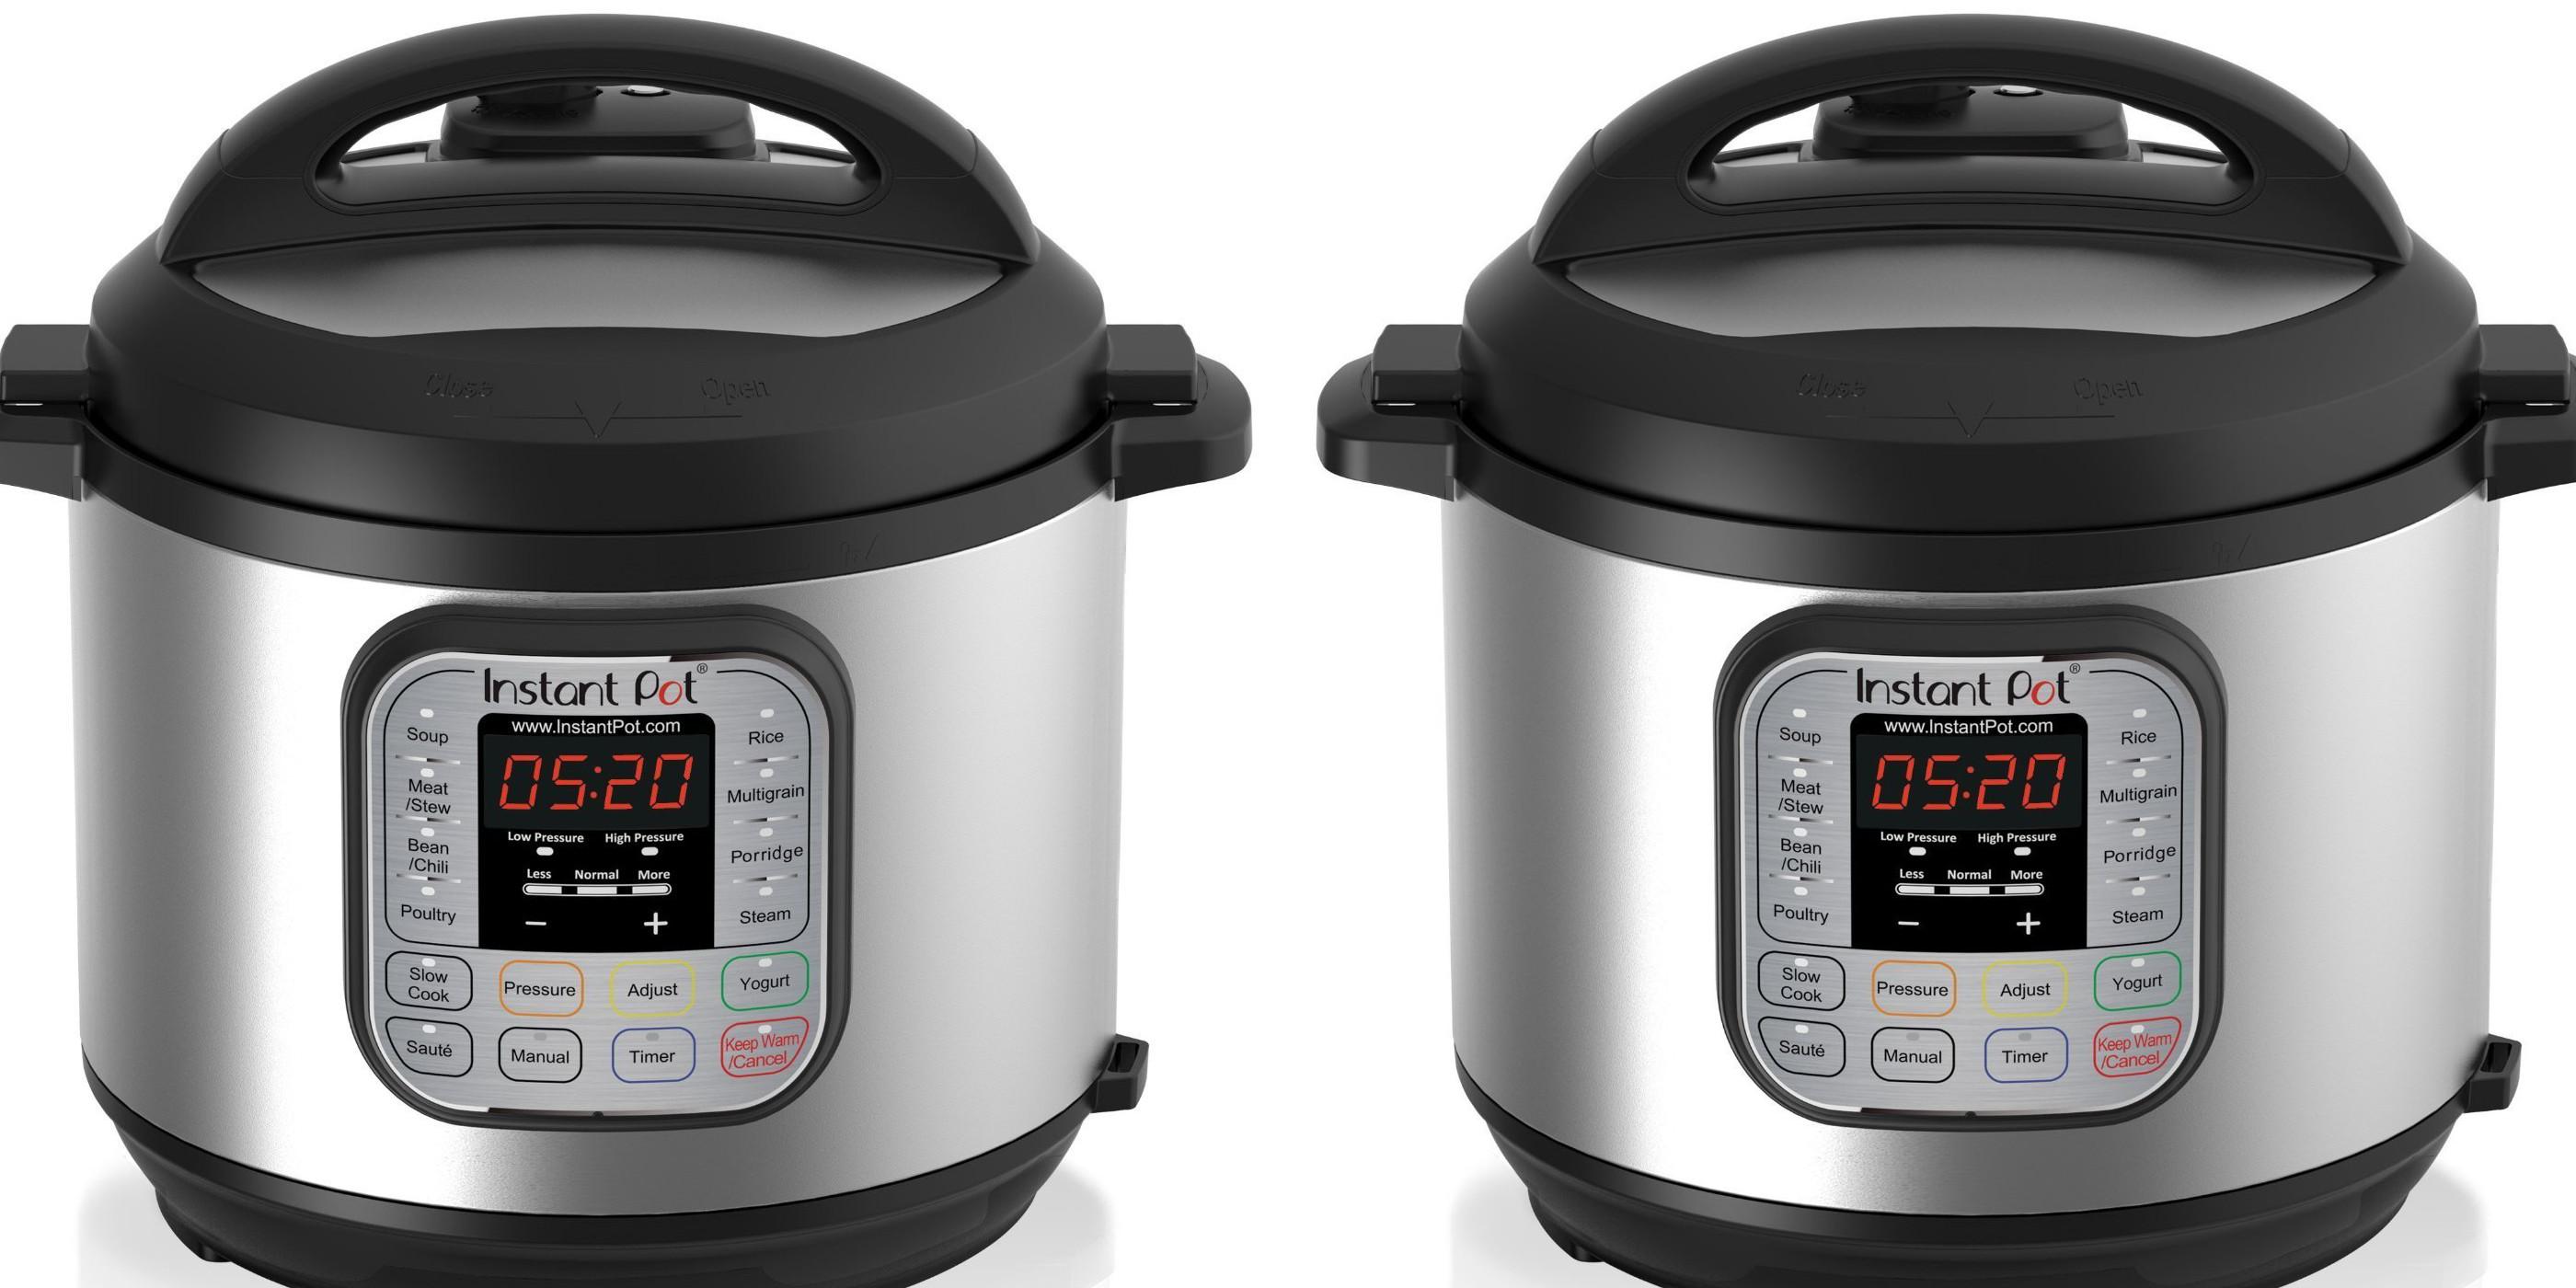 instant-pot-ip-duo60-7-in-1-multi-functional-pressure-cooker-6qt-1000w-6